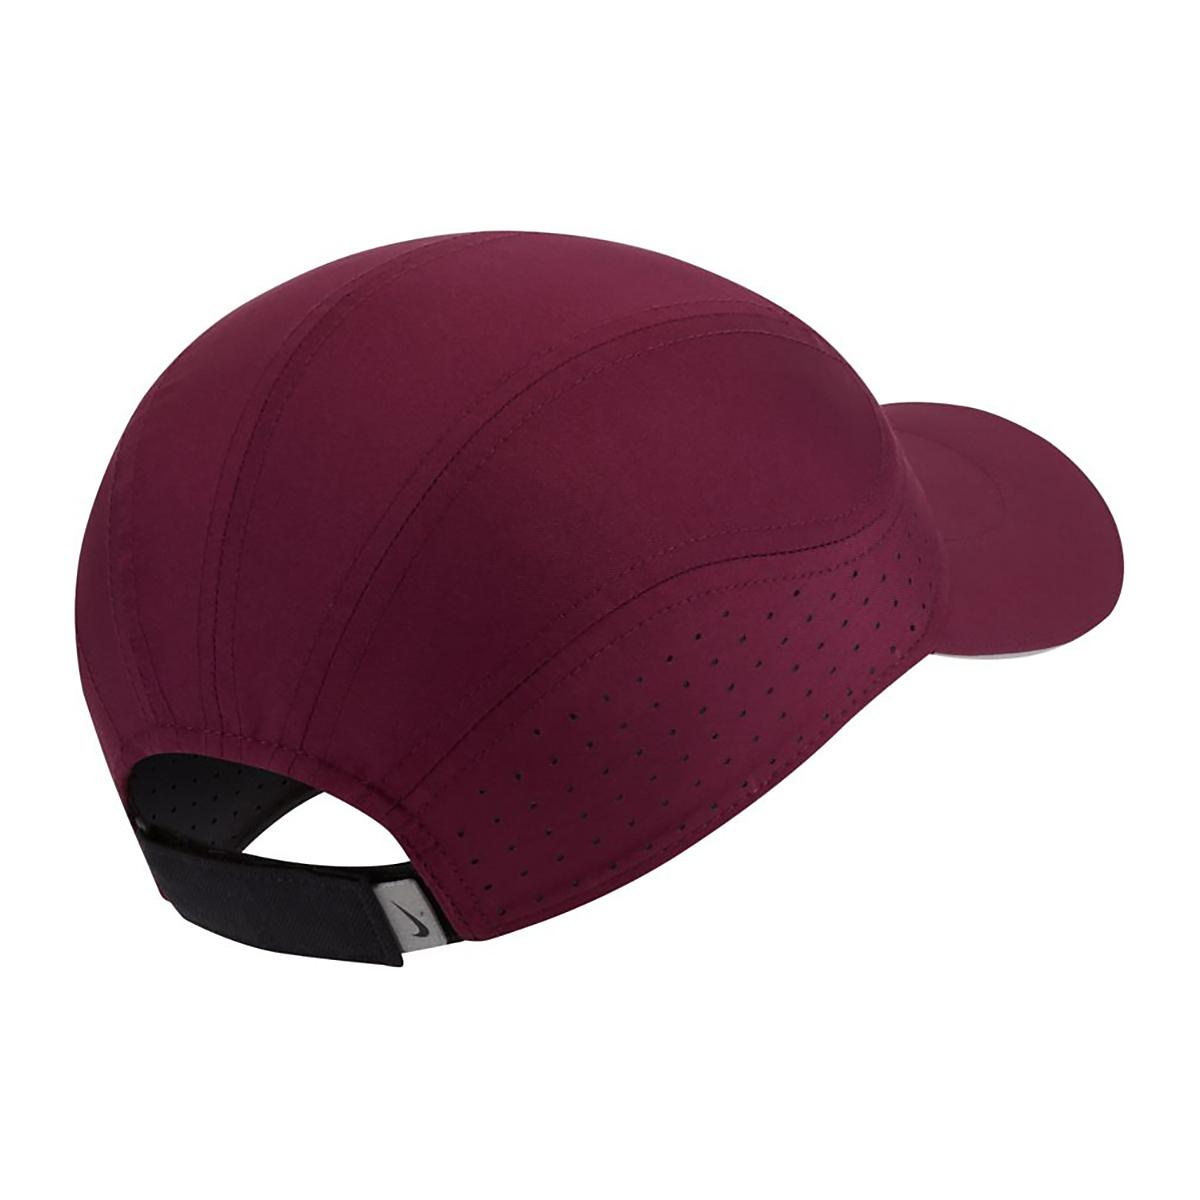 Women's Nike Aerobill Tailwind Elite Cap - Color: Maroon, Maroon, large, image 2